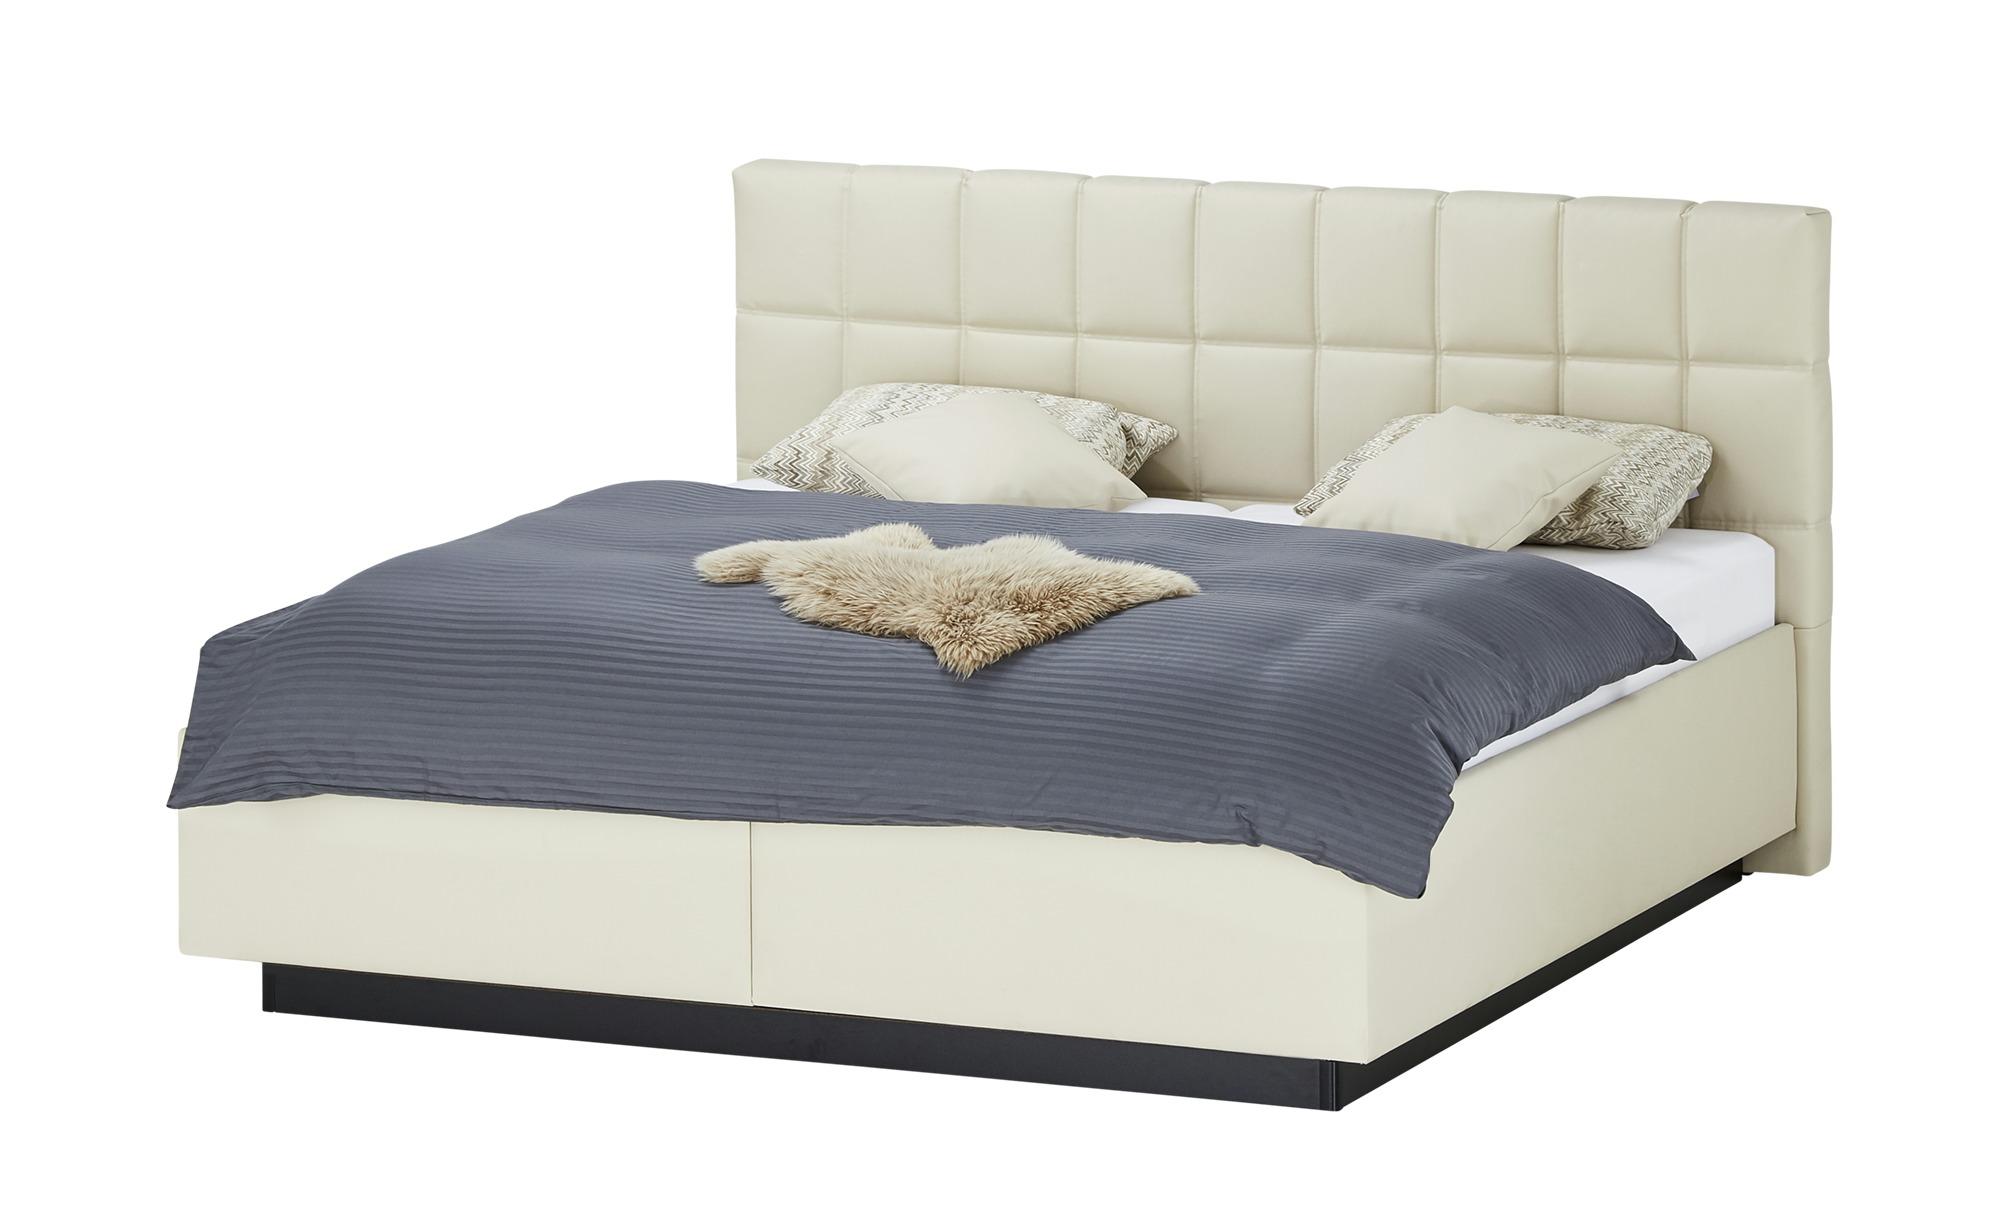 Polsterbett - creme - 214 cm - 119 cm - Betten > Doppelbetten - Möbel Kraft | Schlafzimmer > Betten > Polsterbetten | Sconto